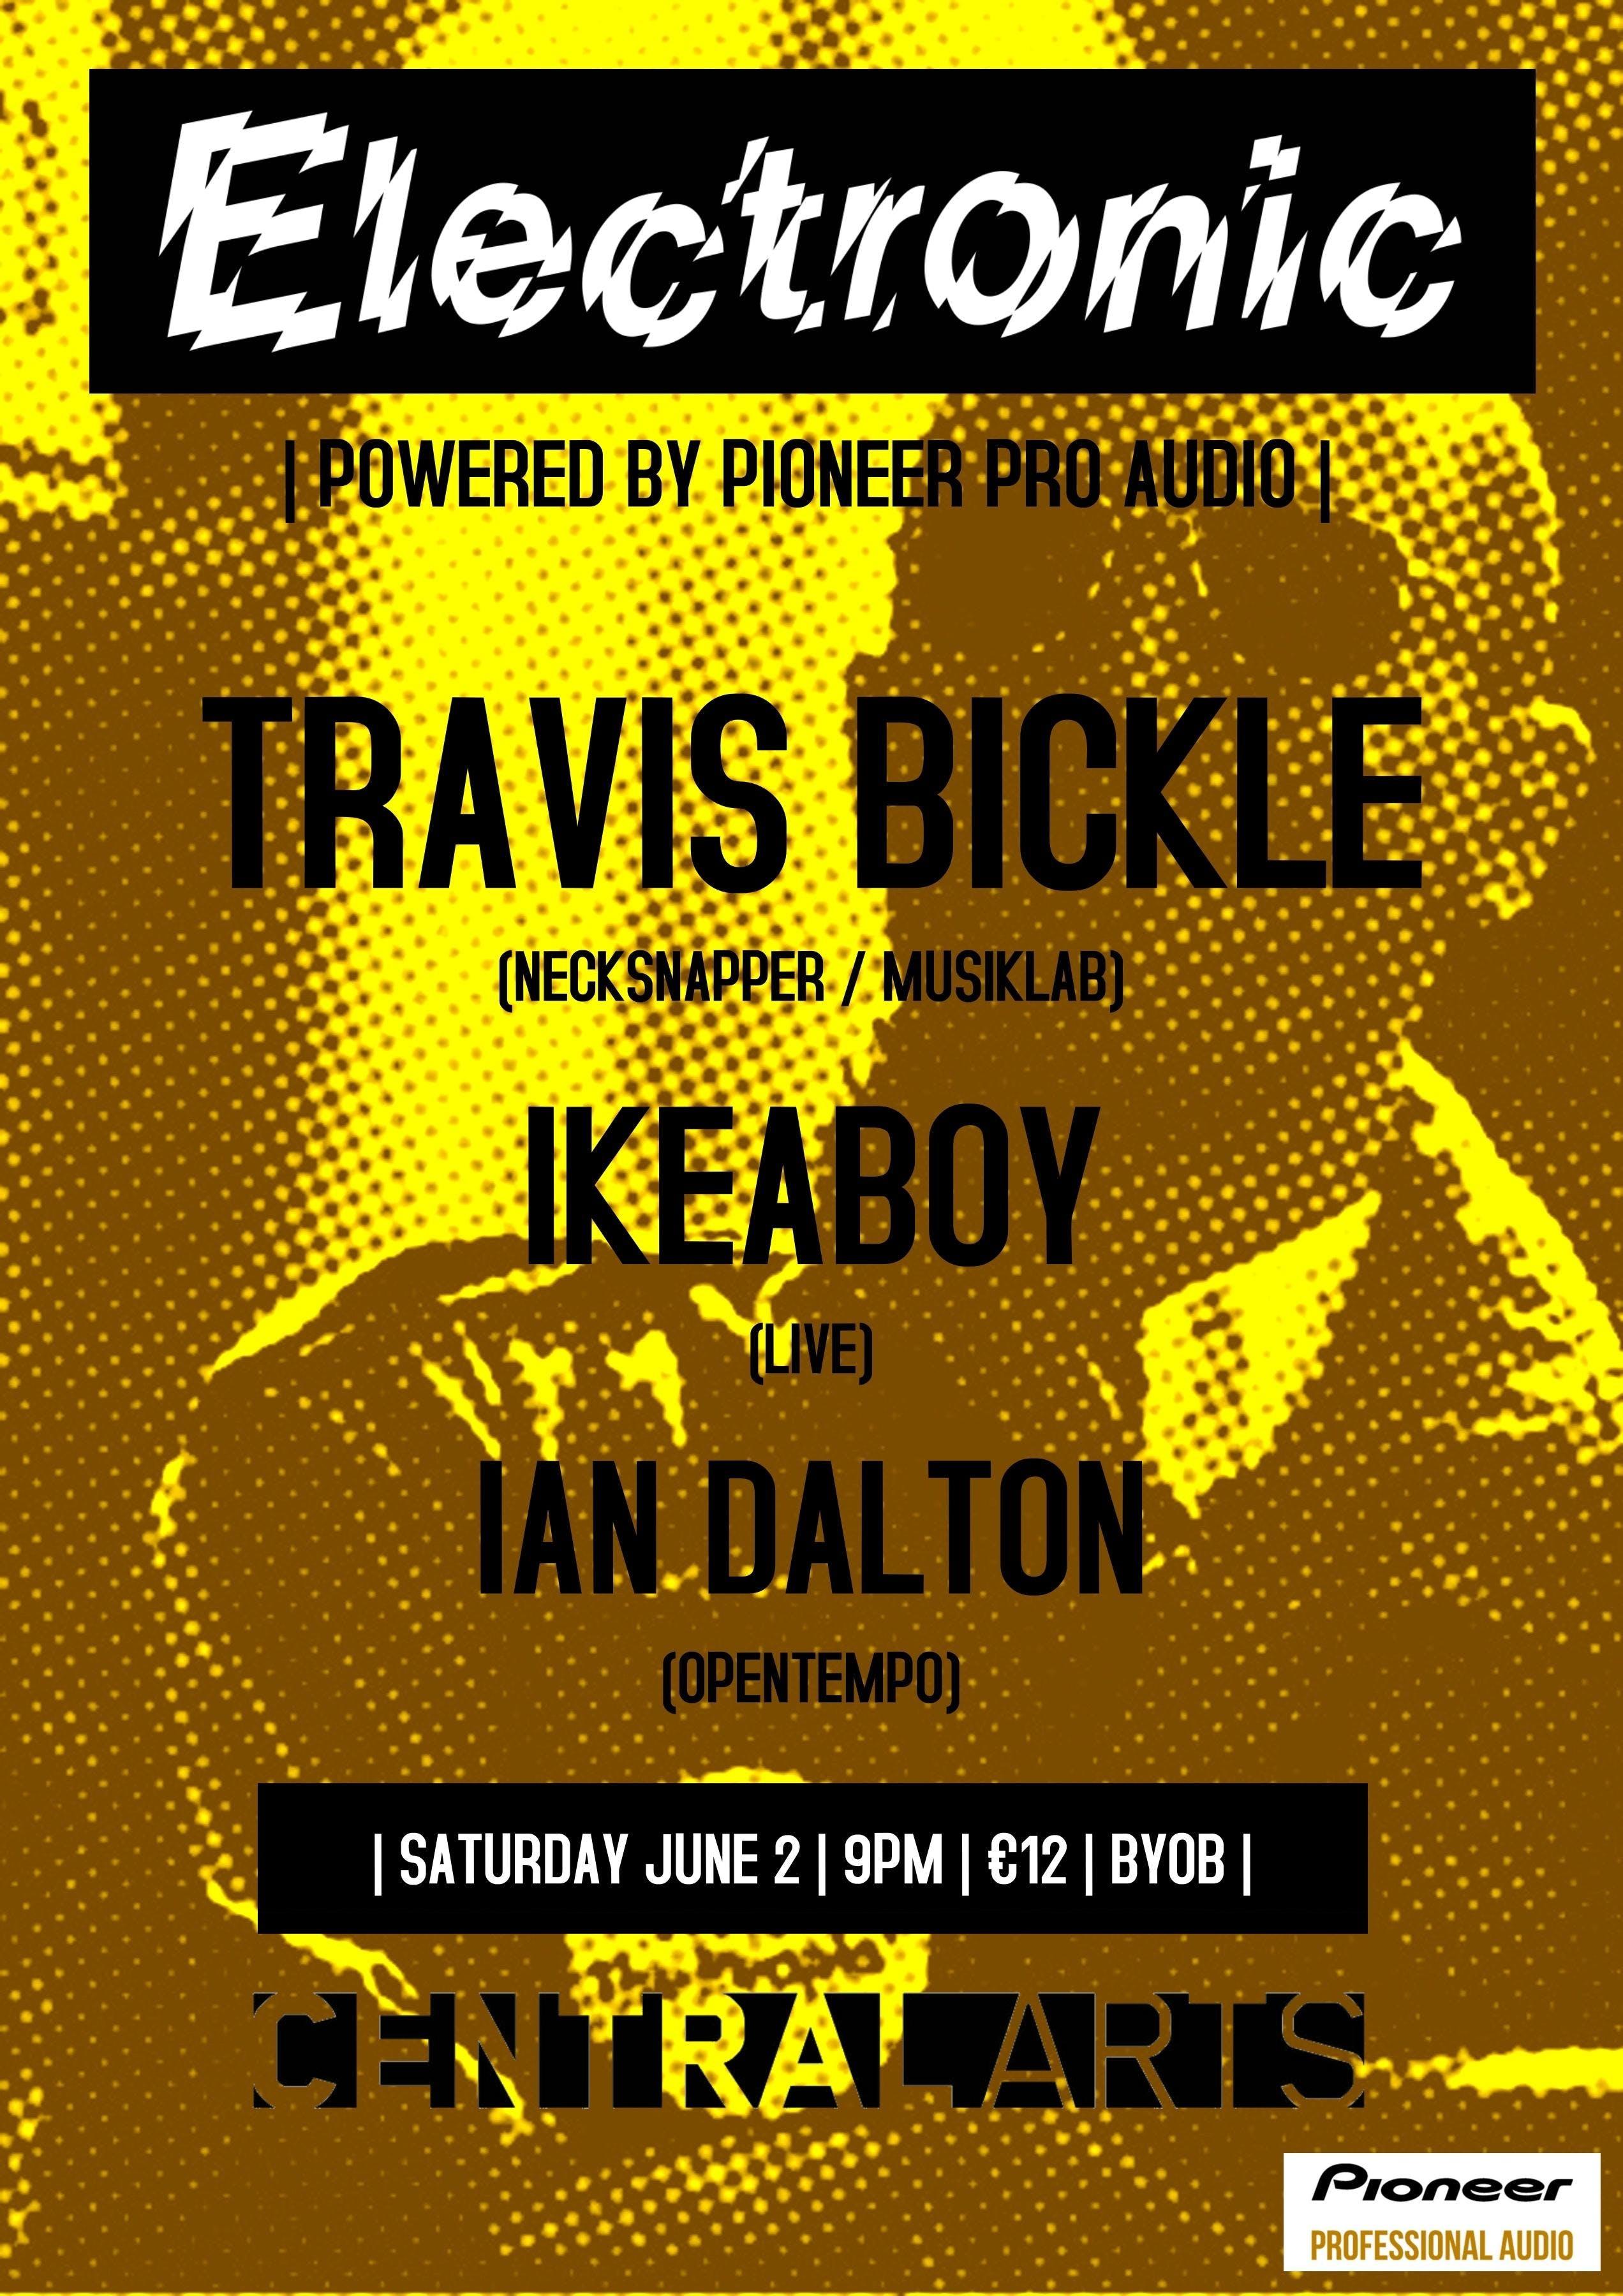 Electronic - Travis Bickle  IkeaBoy  Ian Dalton